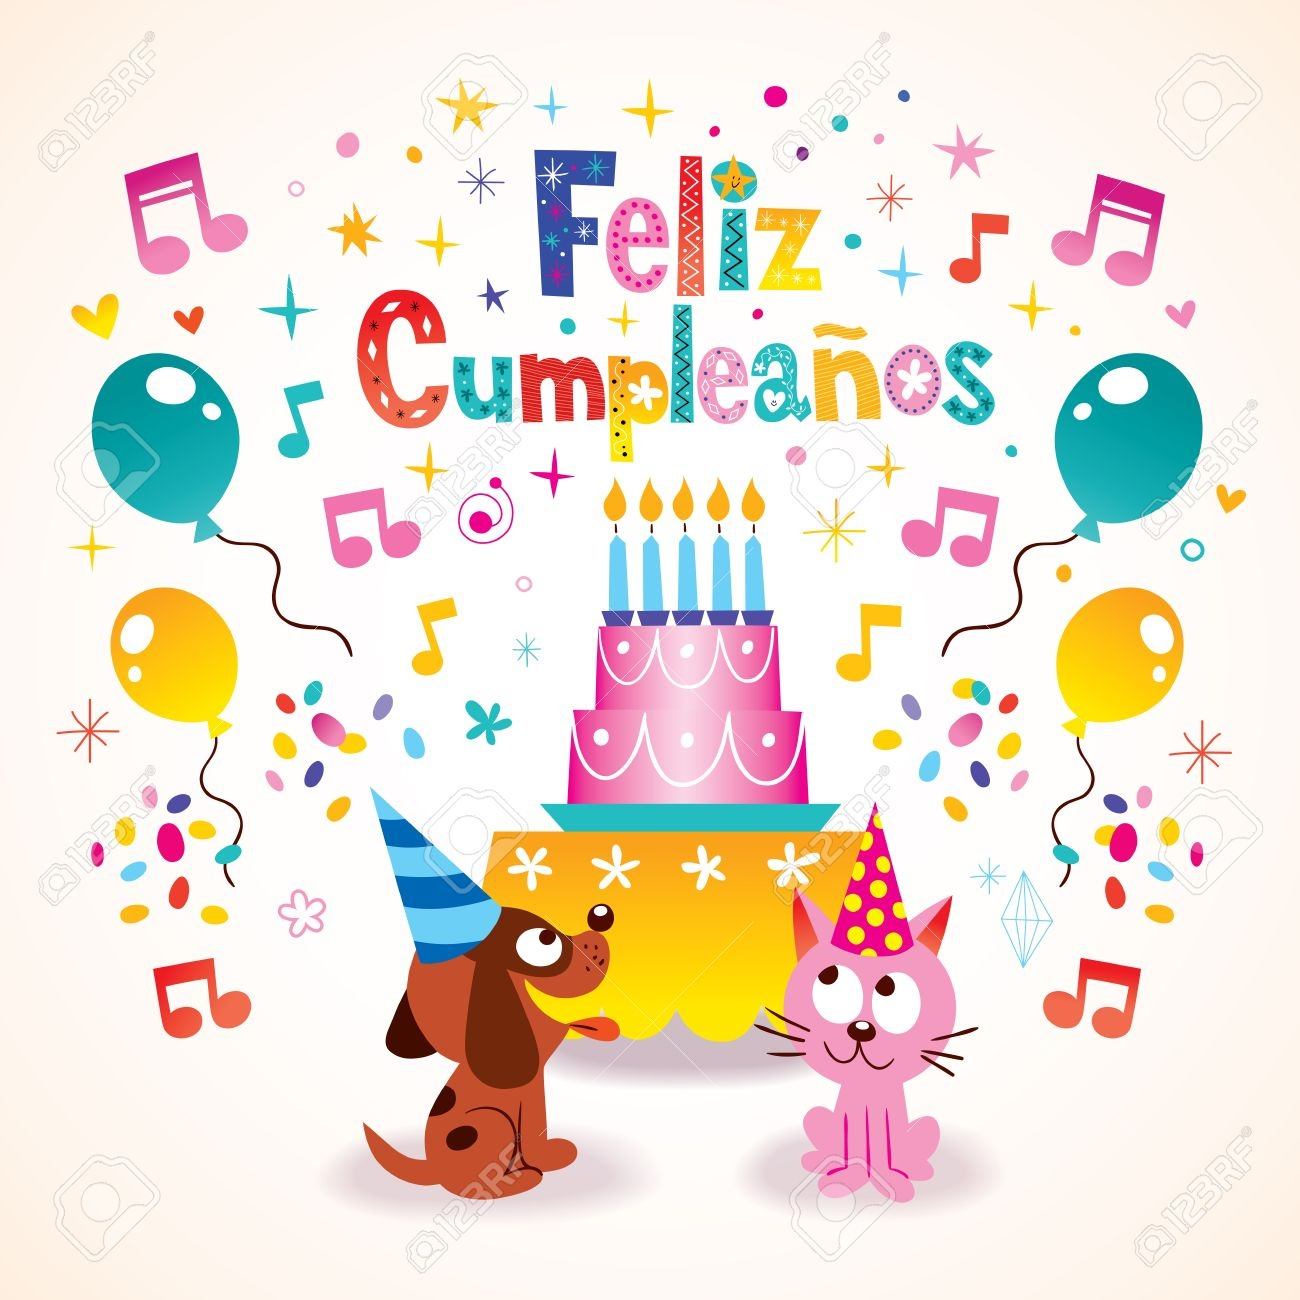 Feliz Cumpleanos - Happy Birthday In Spanish Greeting Card Royalty - Free Printable Happy Birthday Cards In Spanish